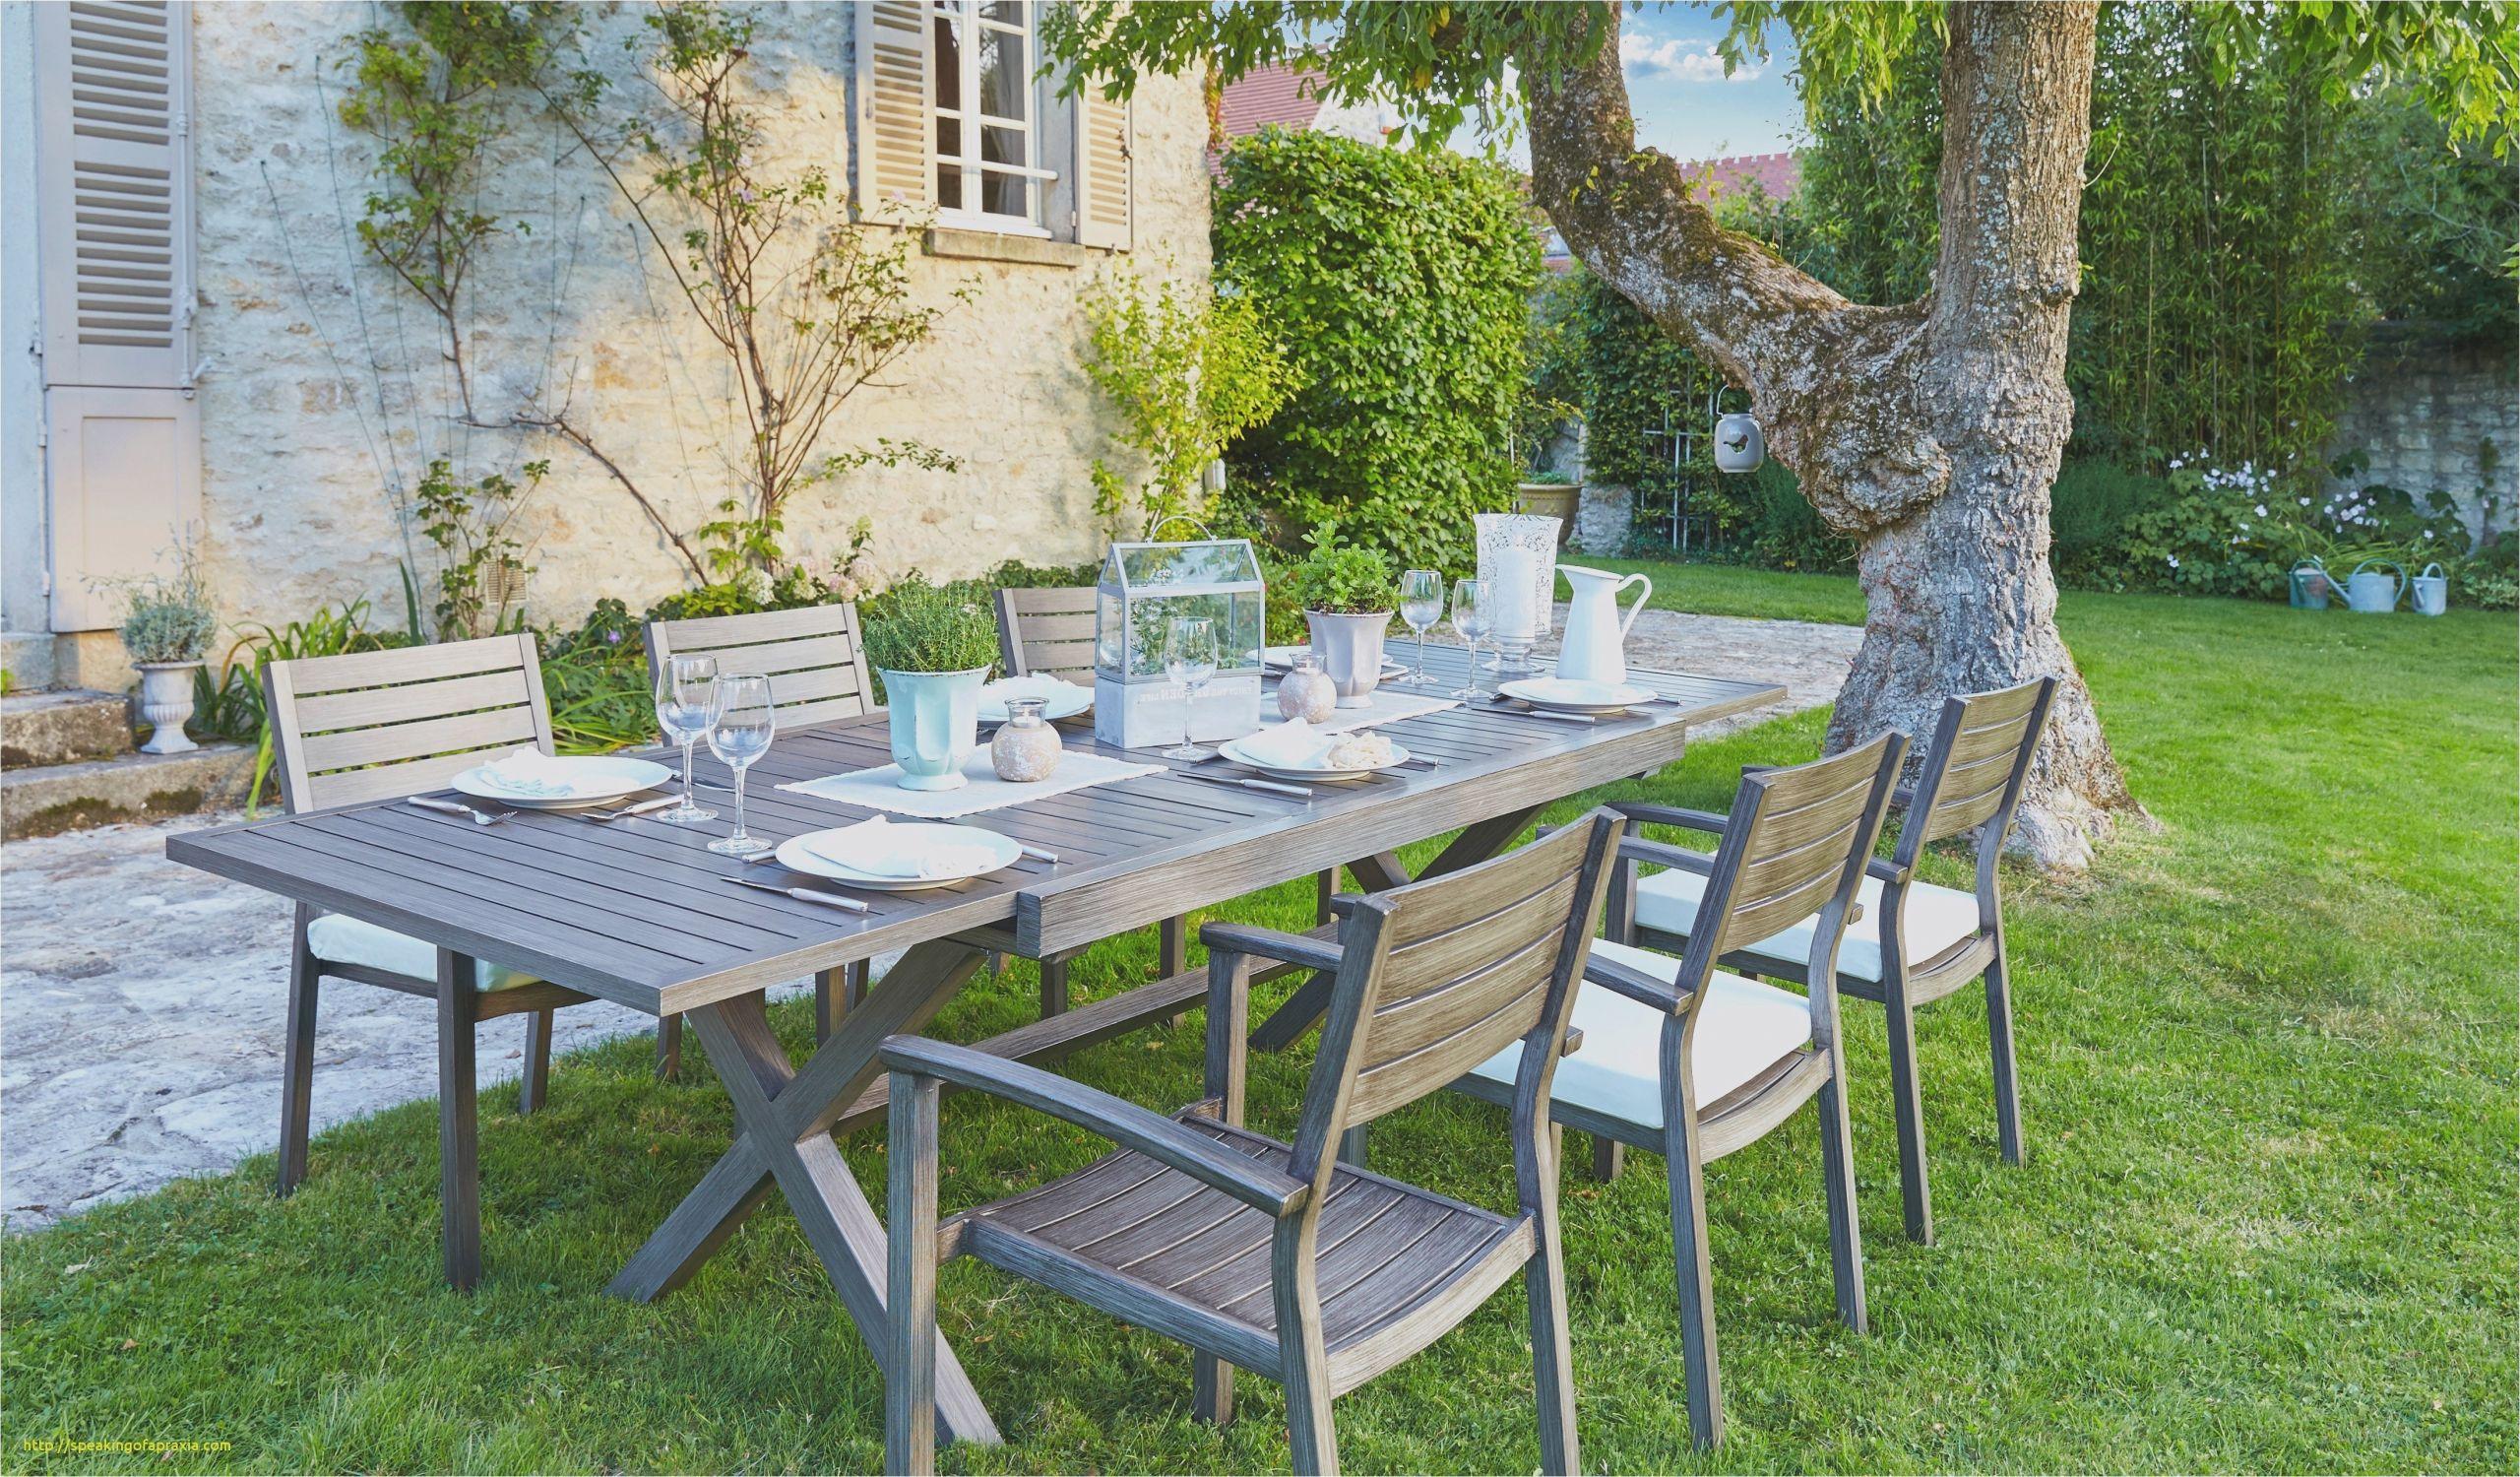 40 Inspirant Table Exterieur Carrefour | Salon Jardin destiné Abris De Jardin Carrefour